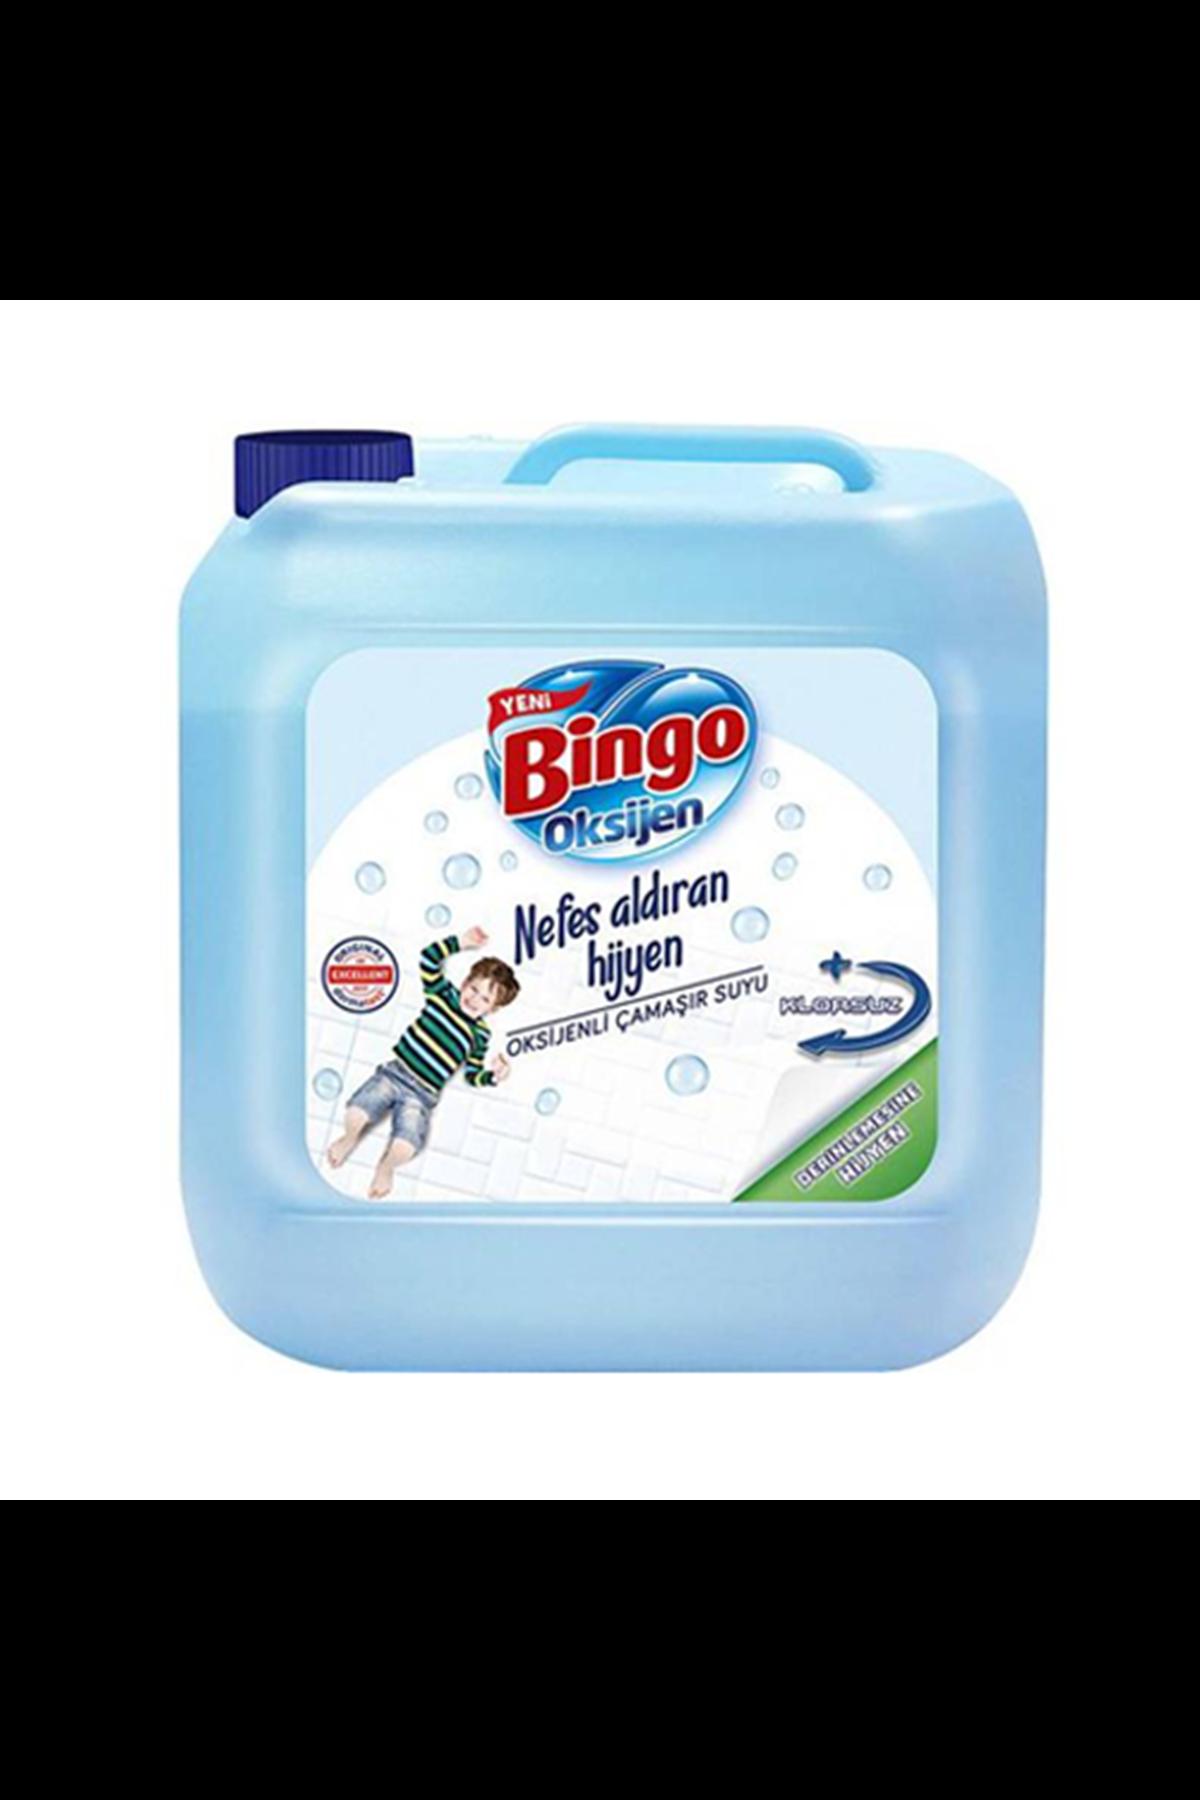 Bingo Oksijen Çamaşır Suyu Parfümsüz 3240 Ml